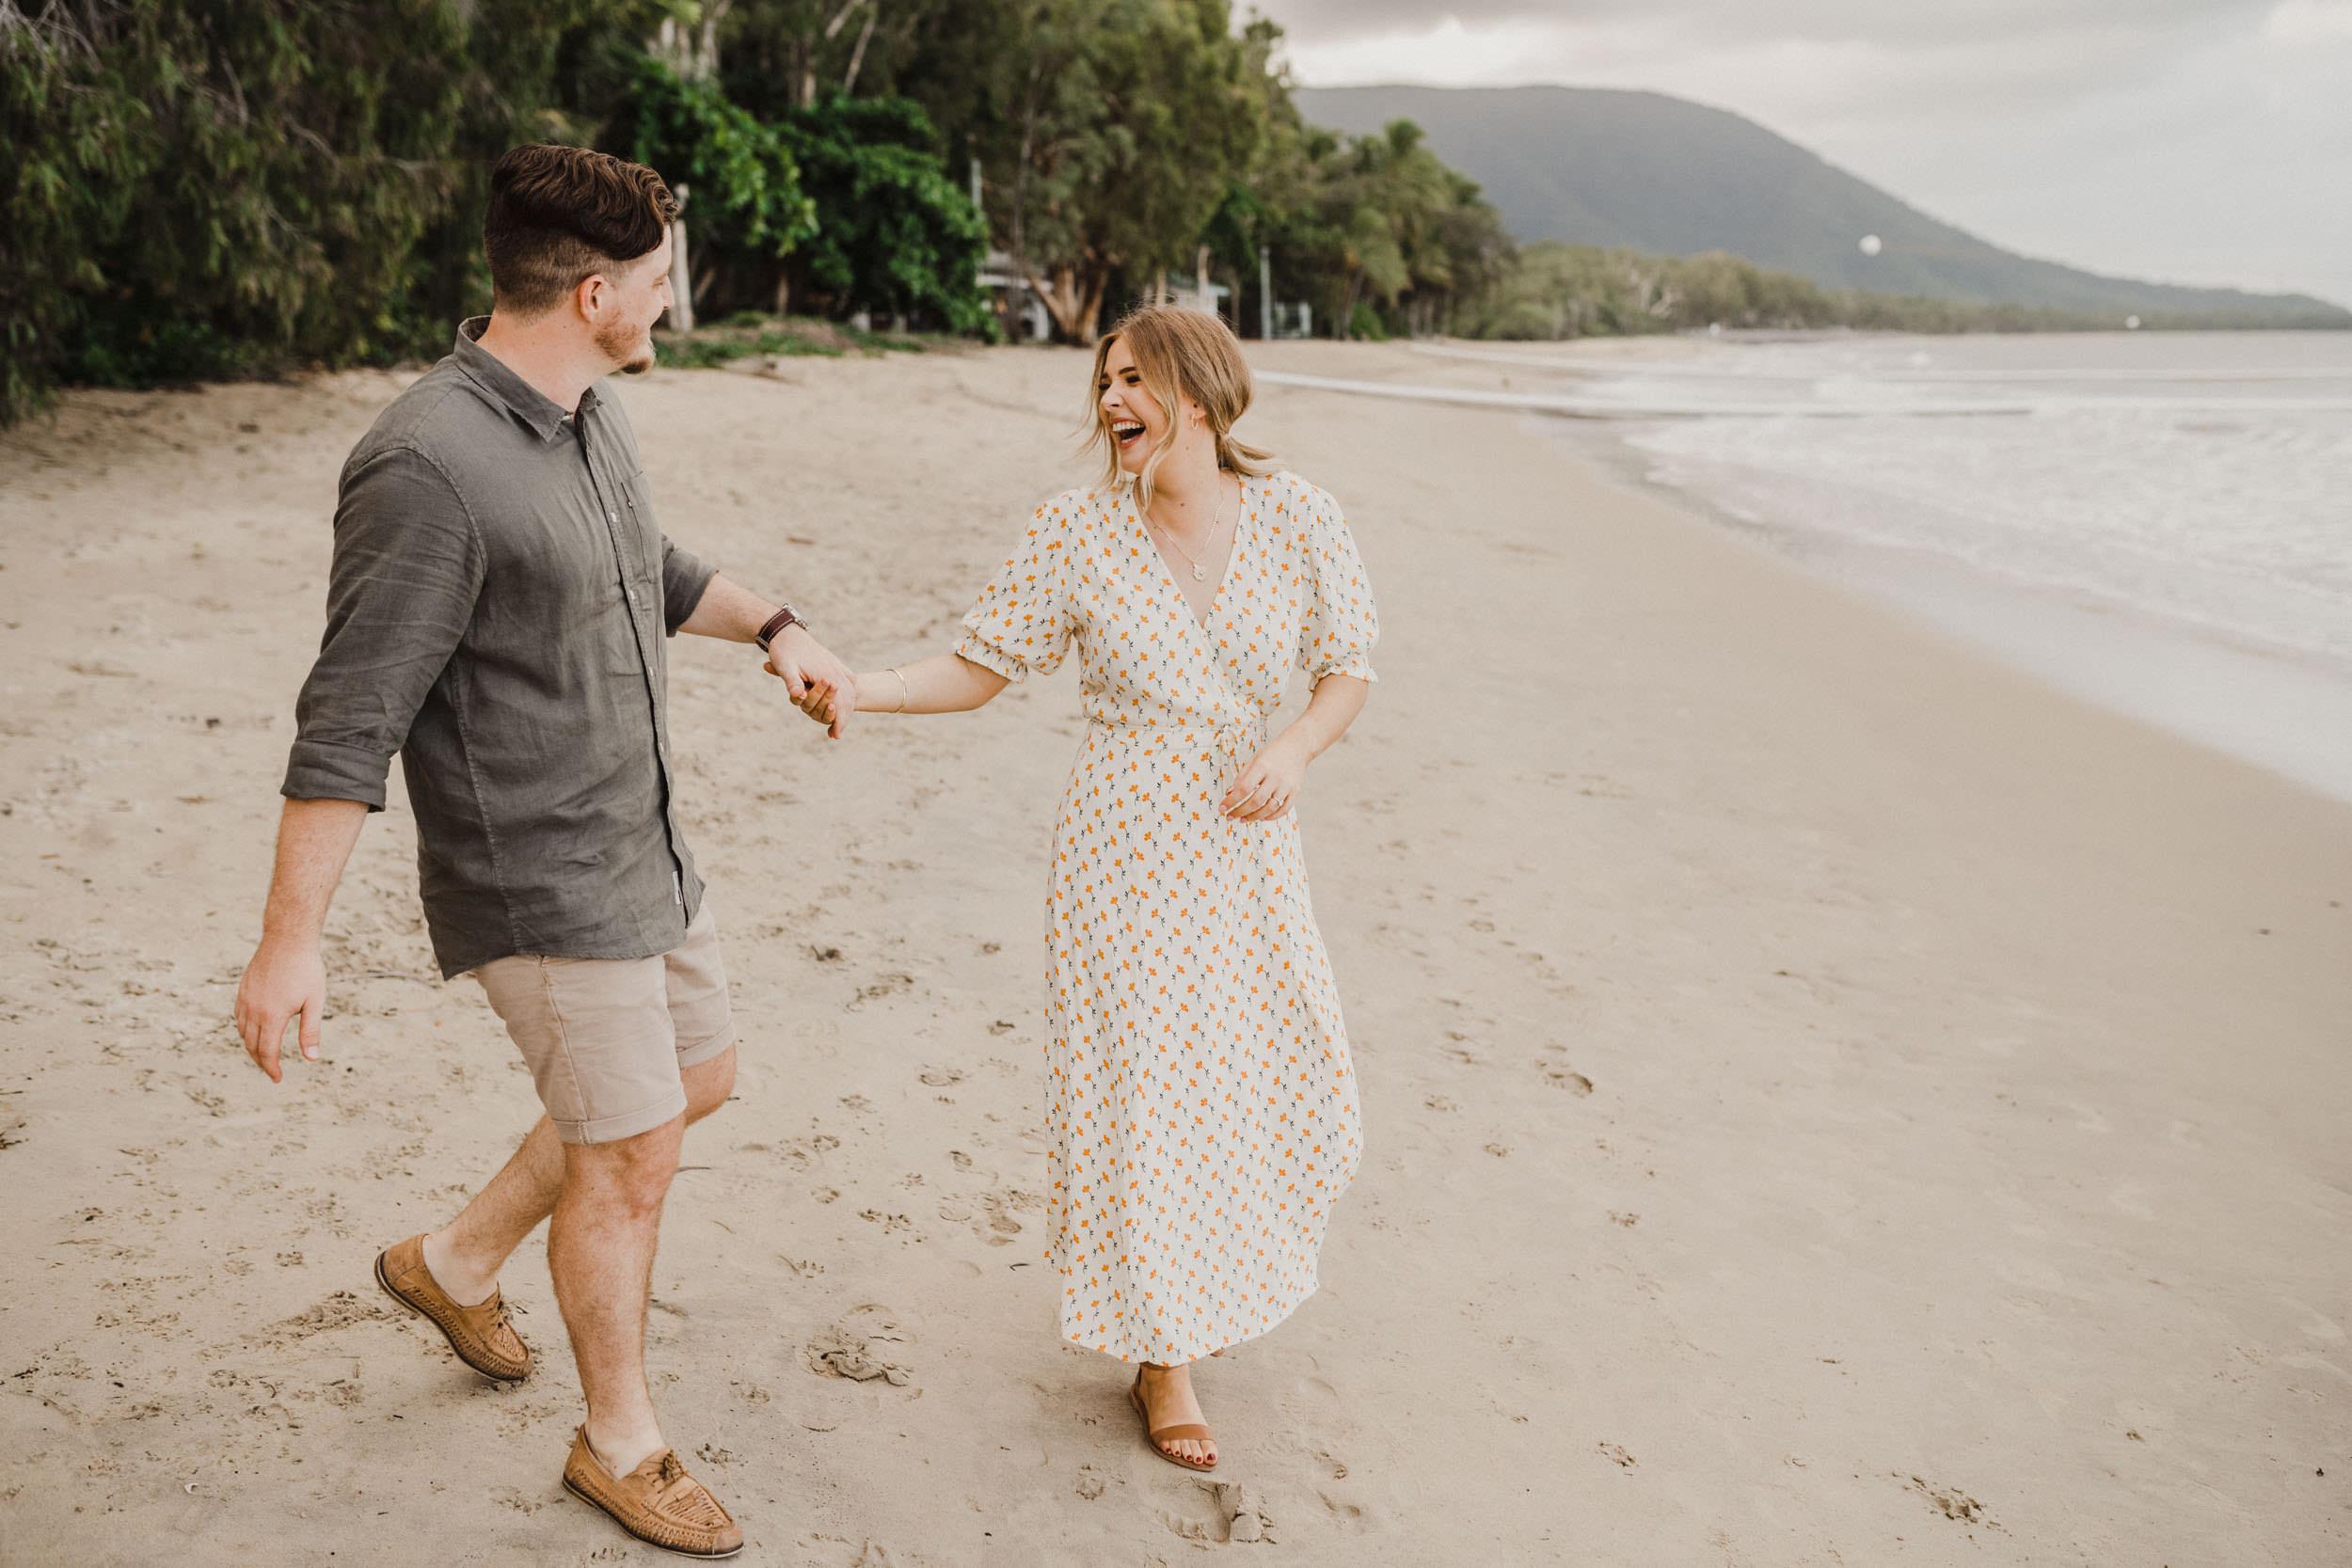 The Raw Photographer - Cairns Wedding Photographer - Beach Engagement Shoot - Candid Picnic-17.jpg